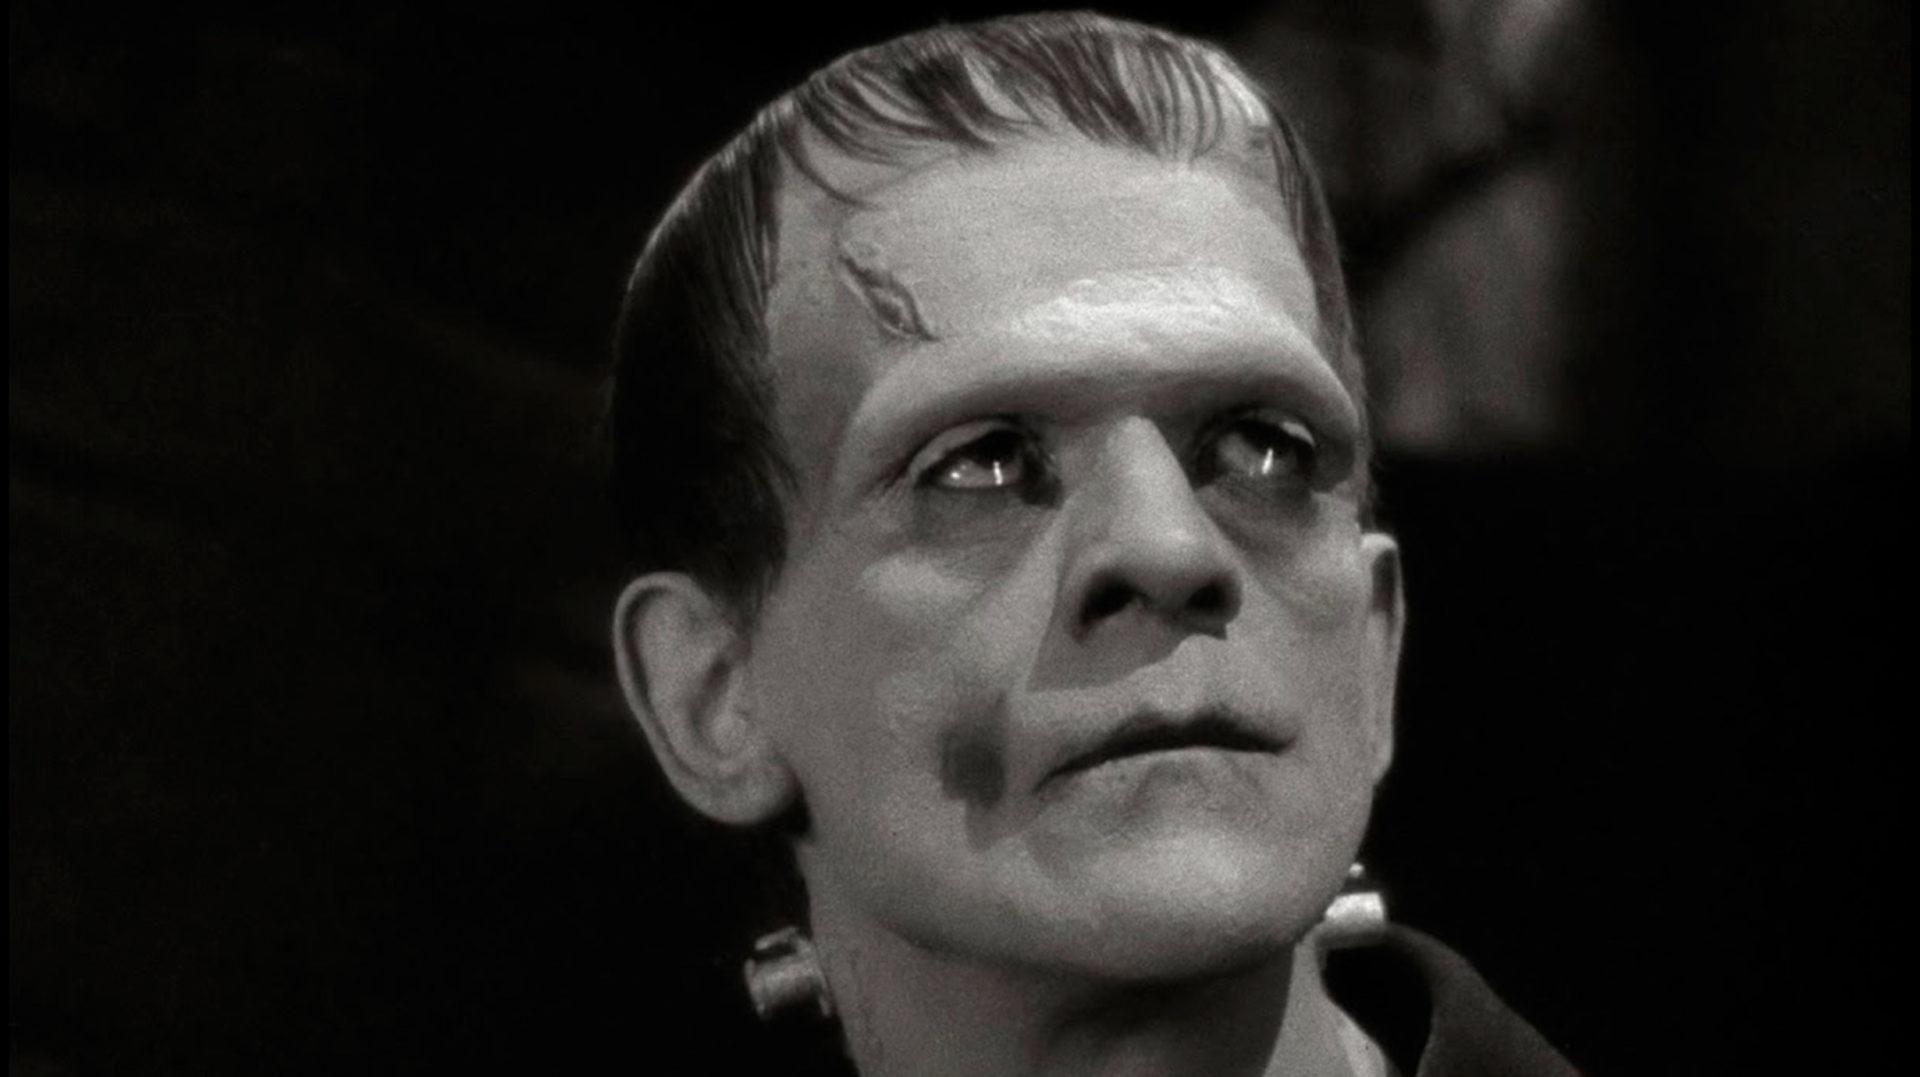 Imatges cinematogràfiques de Frankenstein